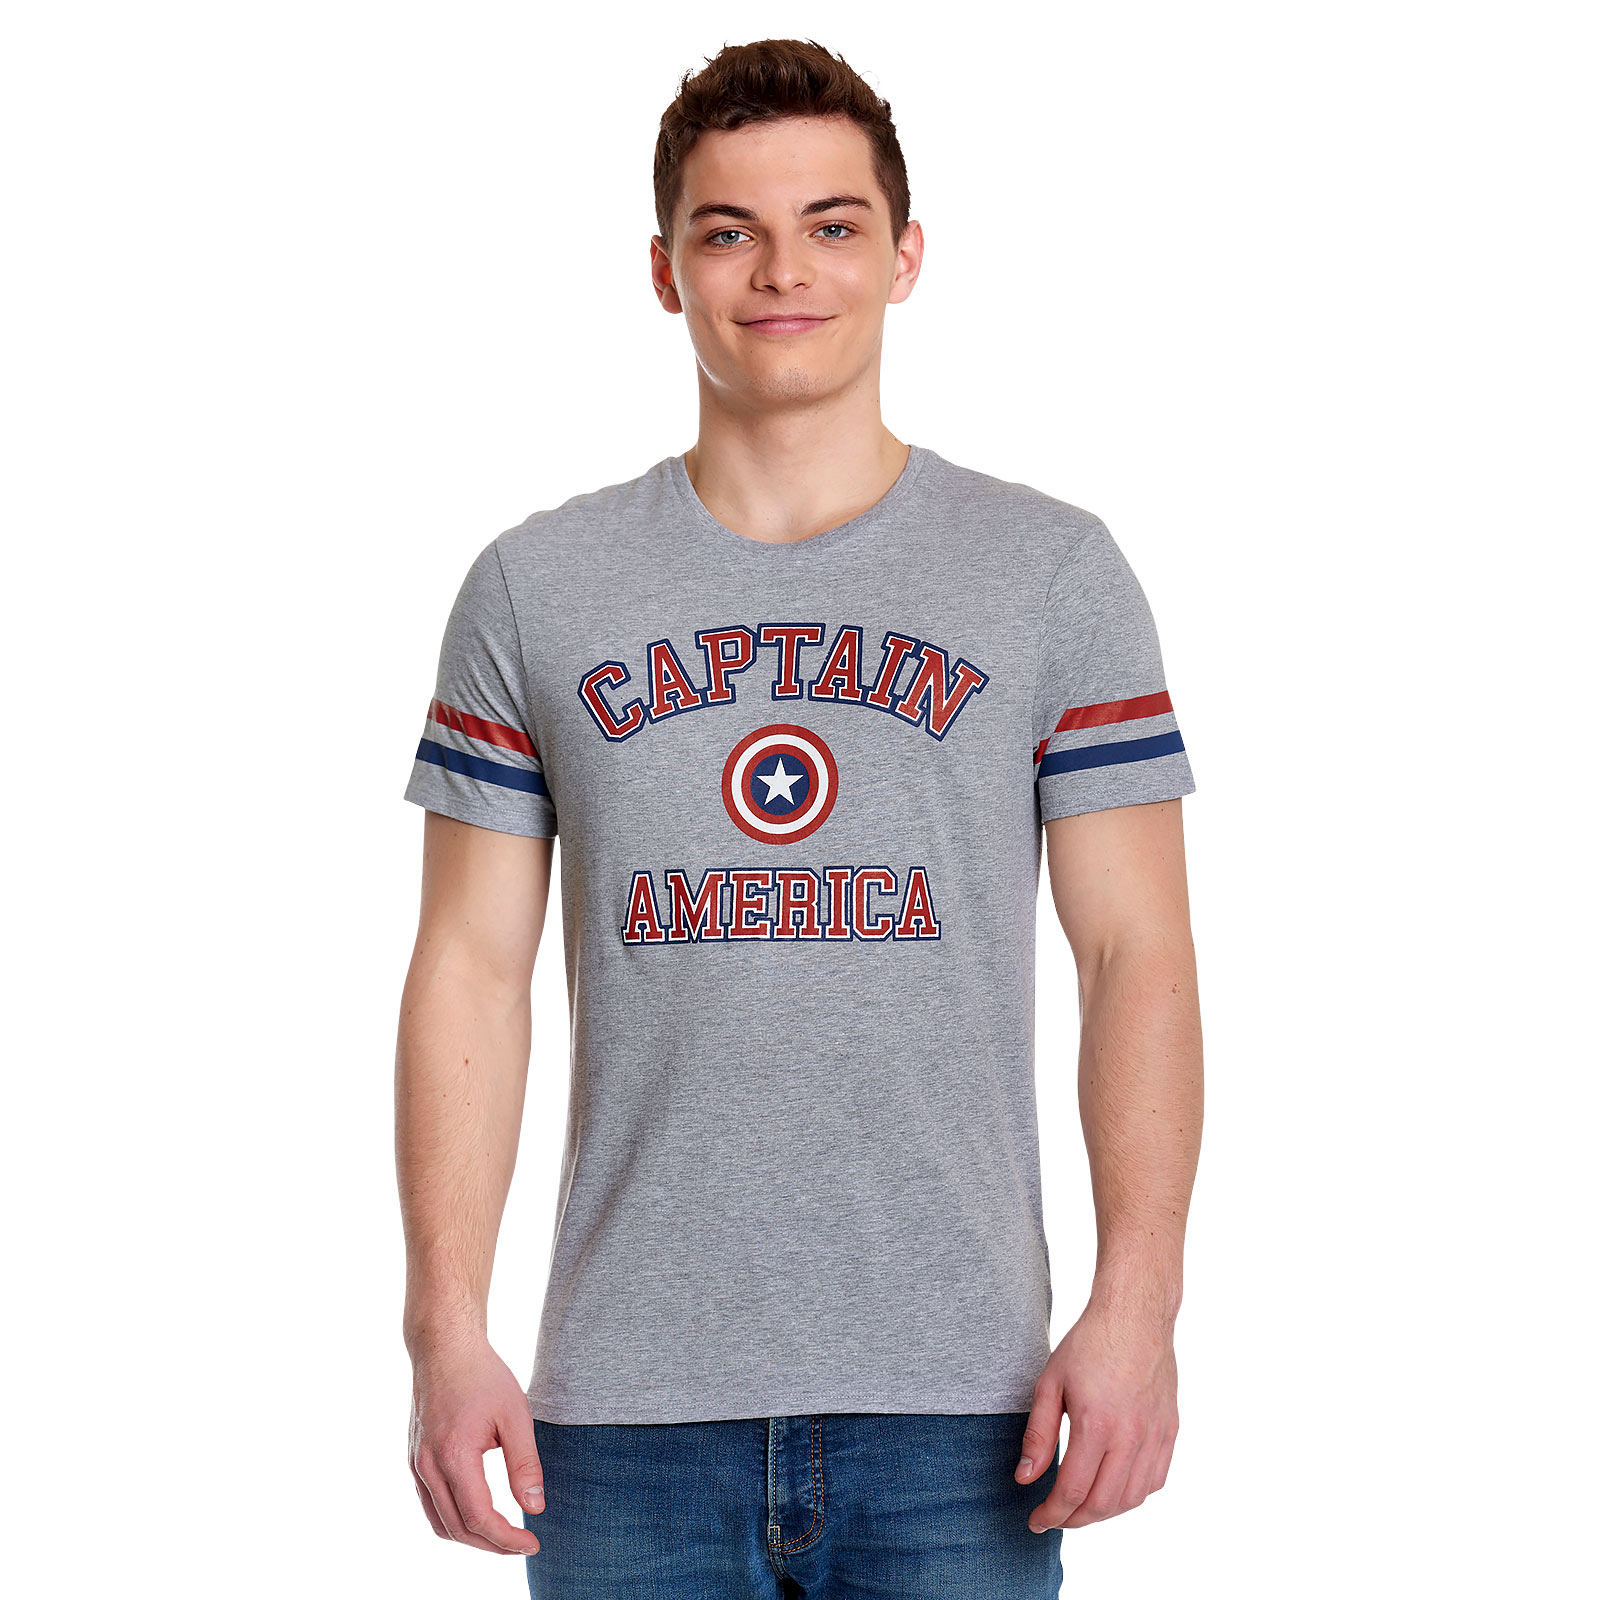 Captain America - College T-Shirt grau